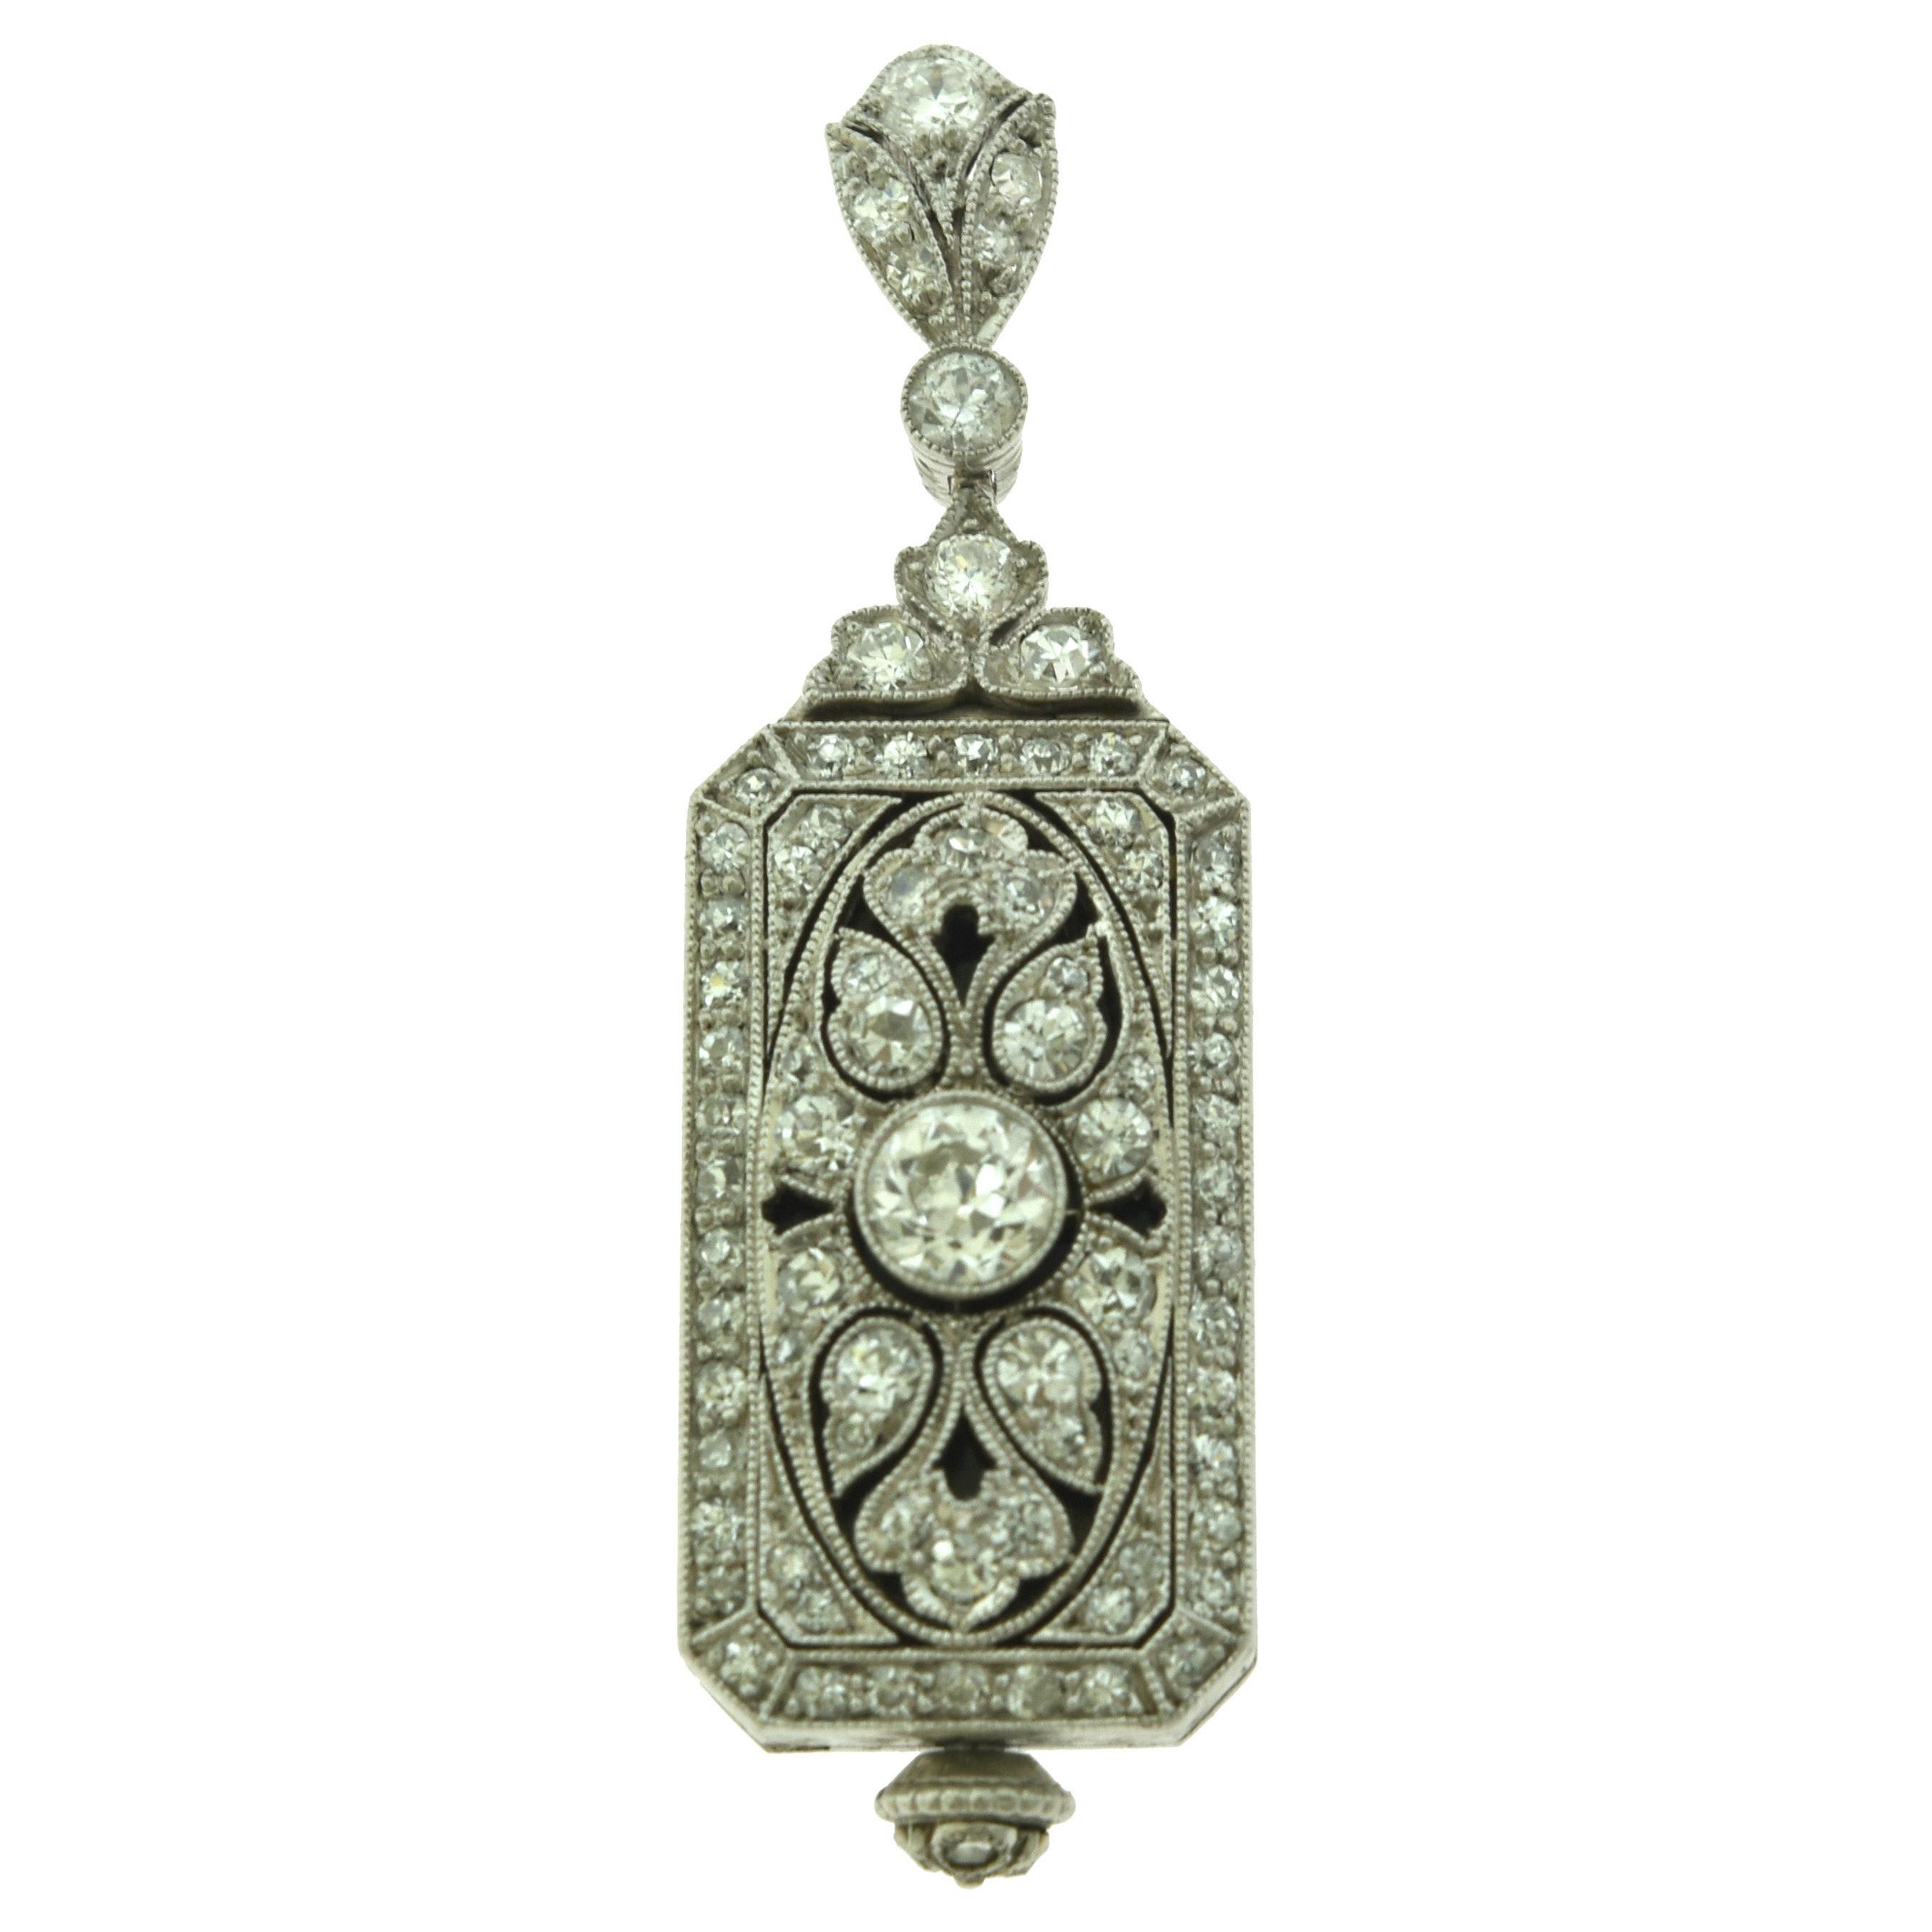 Art Deco Platinum Pendant/ Watch with Diamonds by J.E. Caldwell